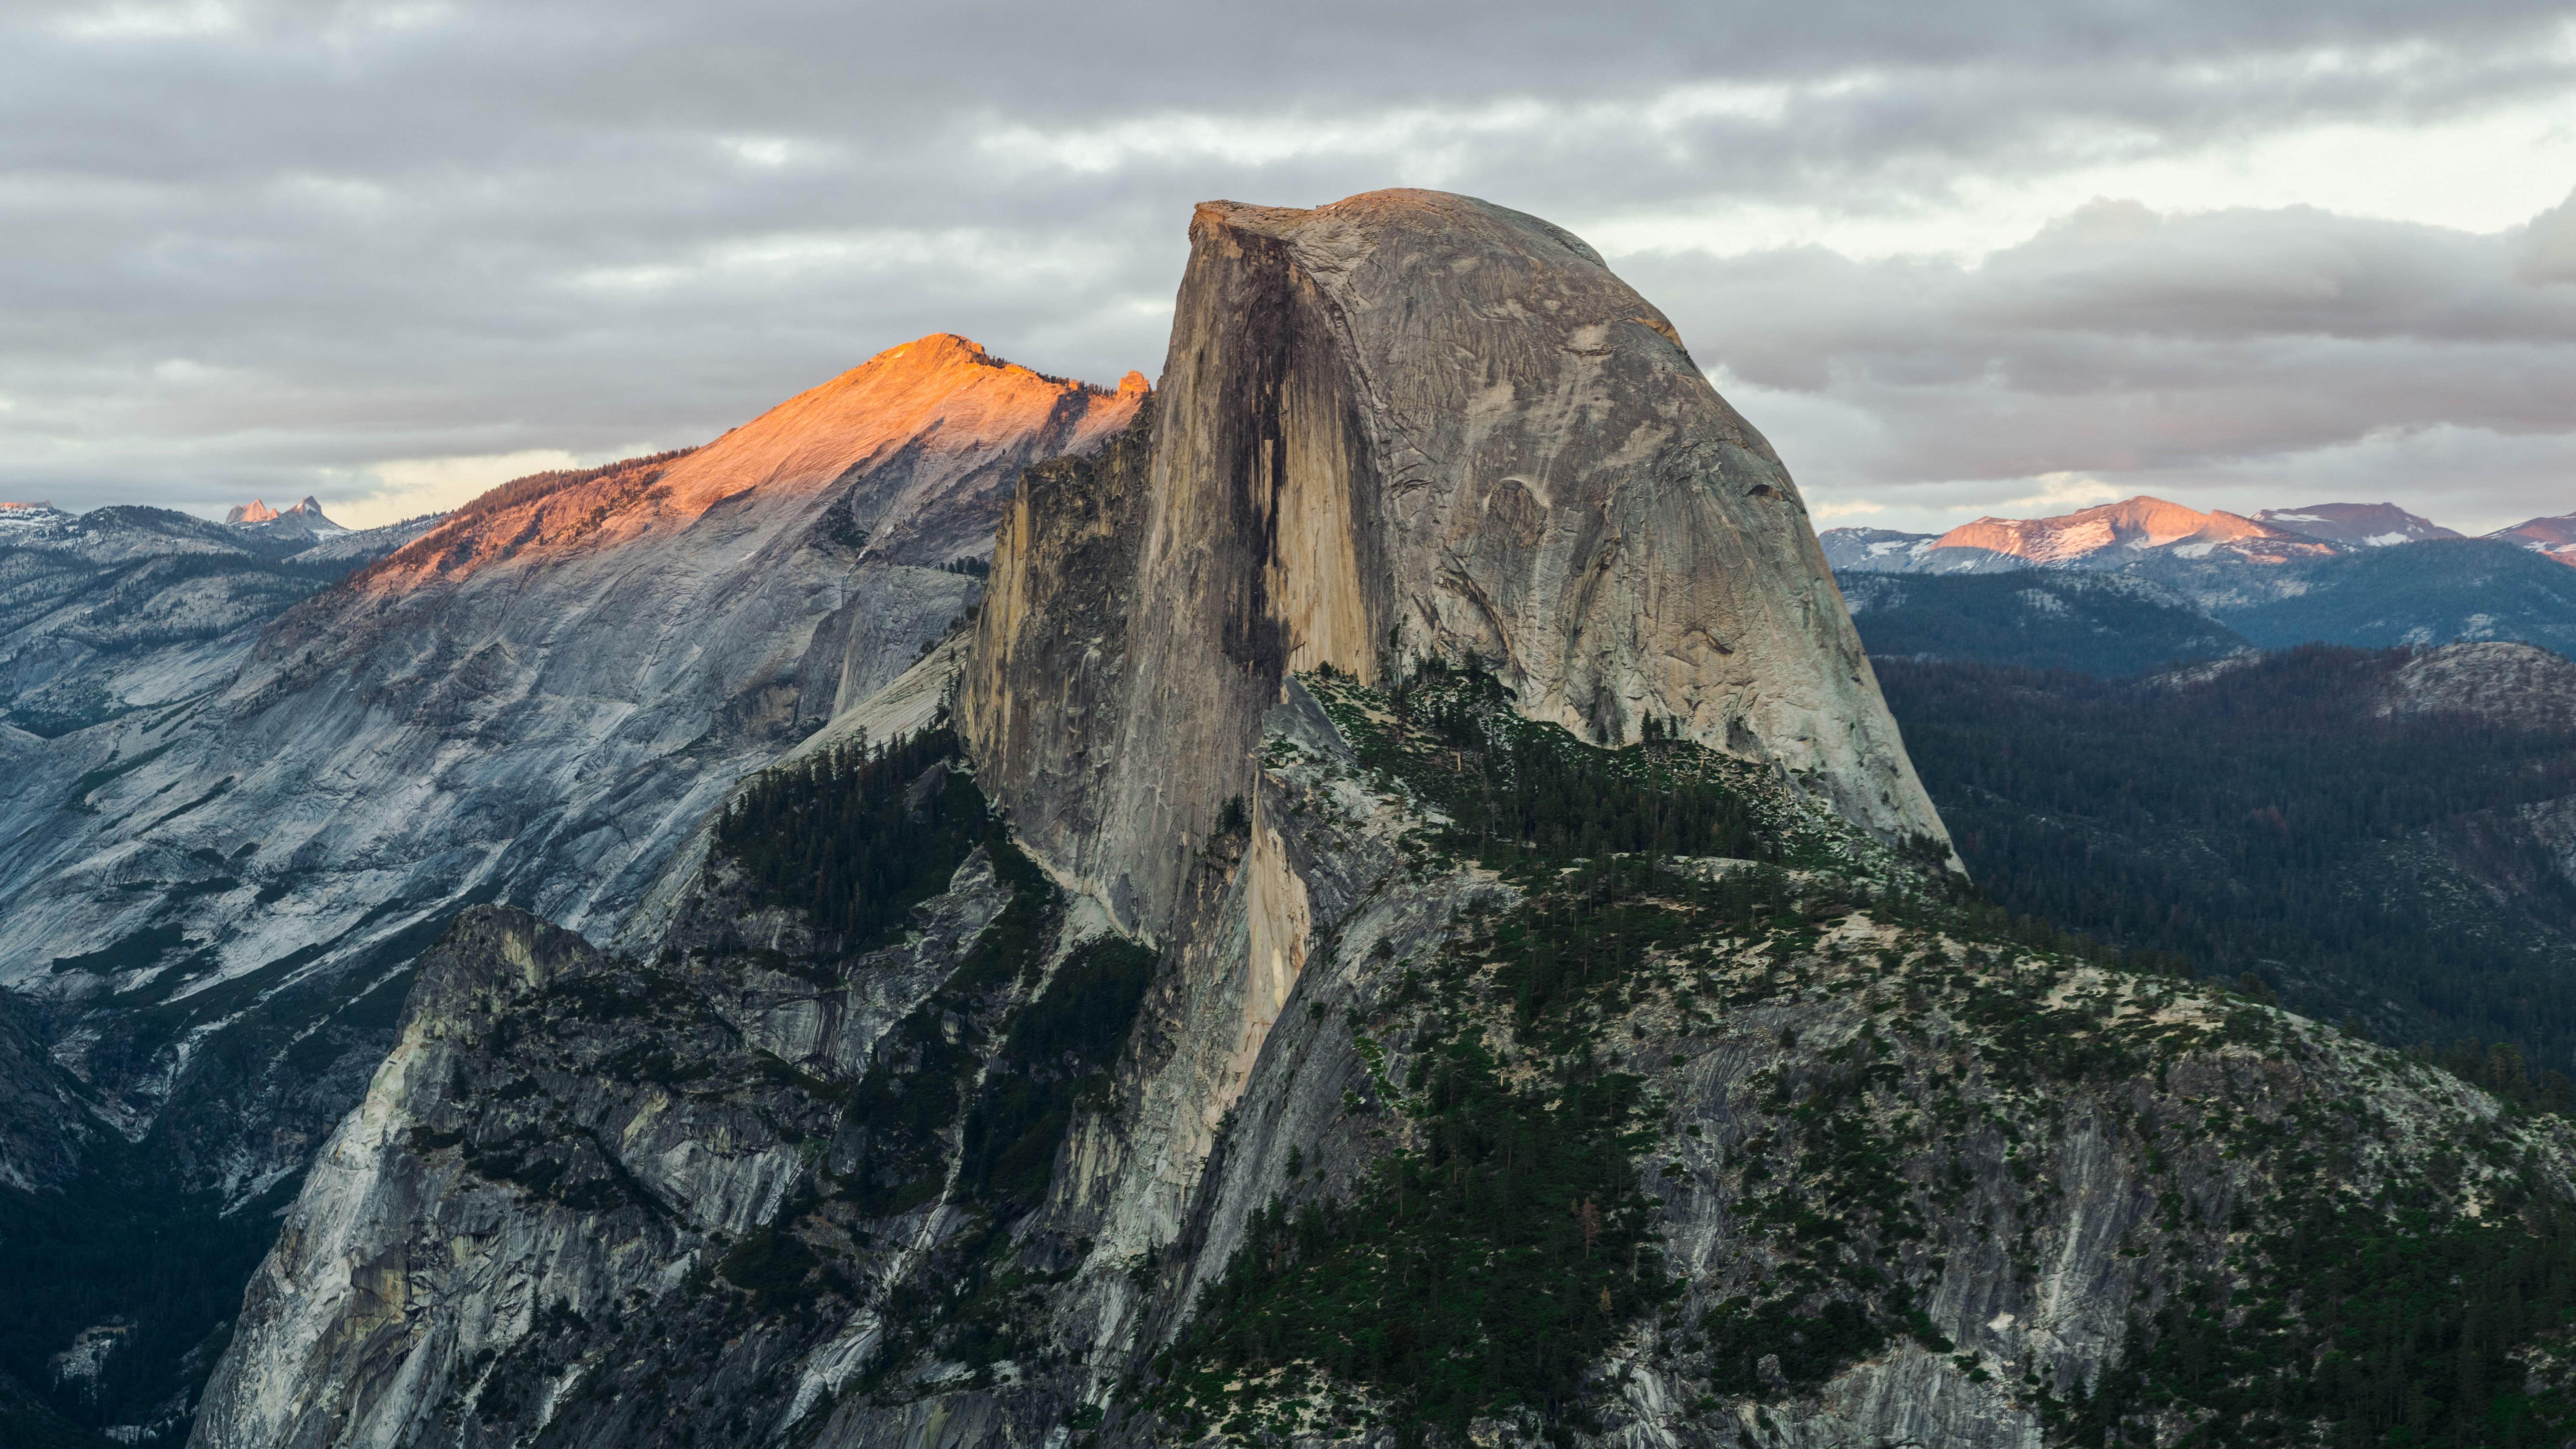 Fall Wallpaper 4d Wallpaper Half Dome Mountain Yosemite National Park